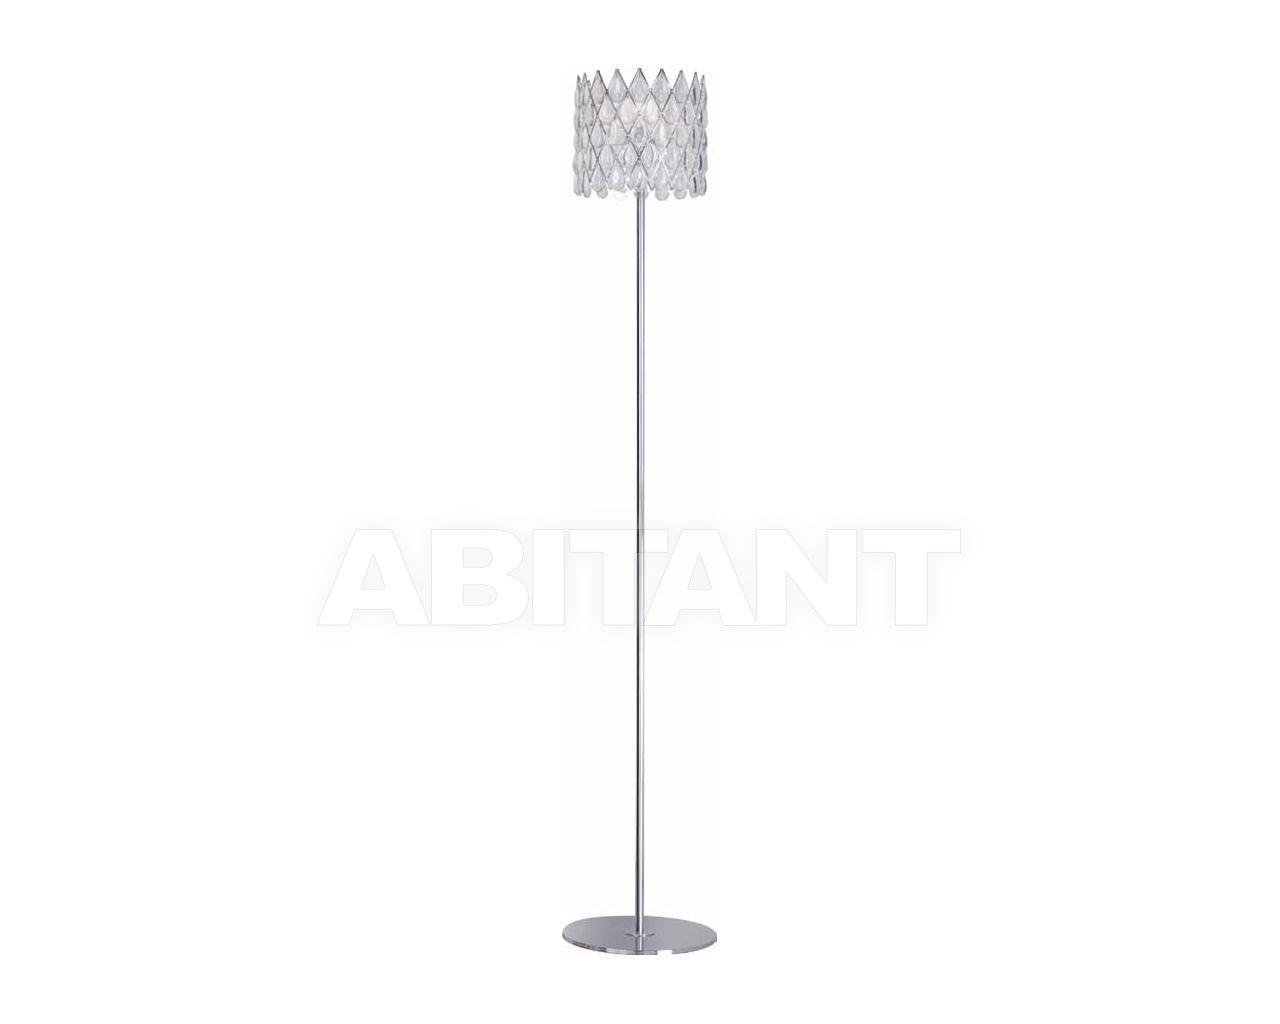 Купить Торшер Bucintoro Ruggiu Lightingwear Giodi S4181.11